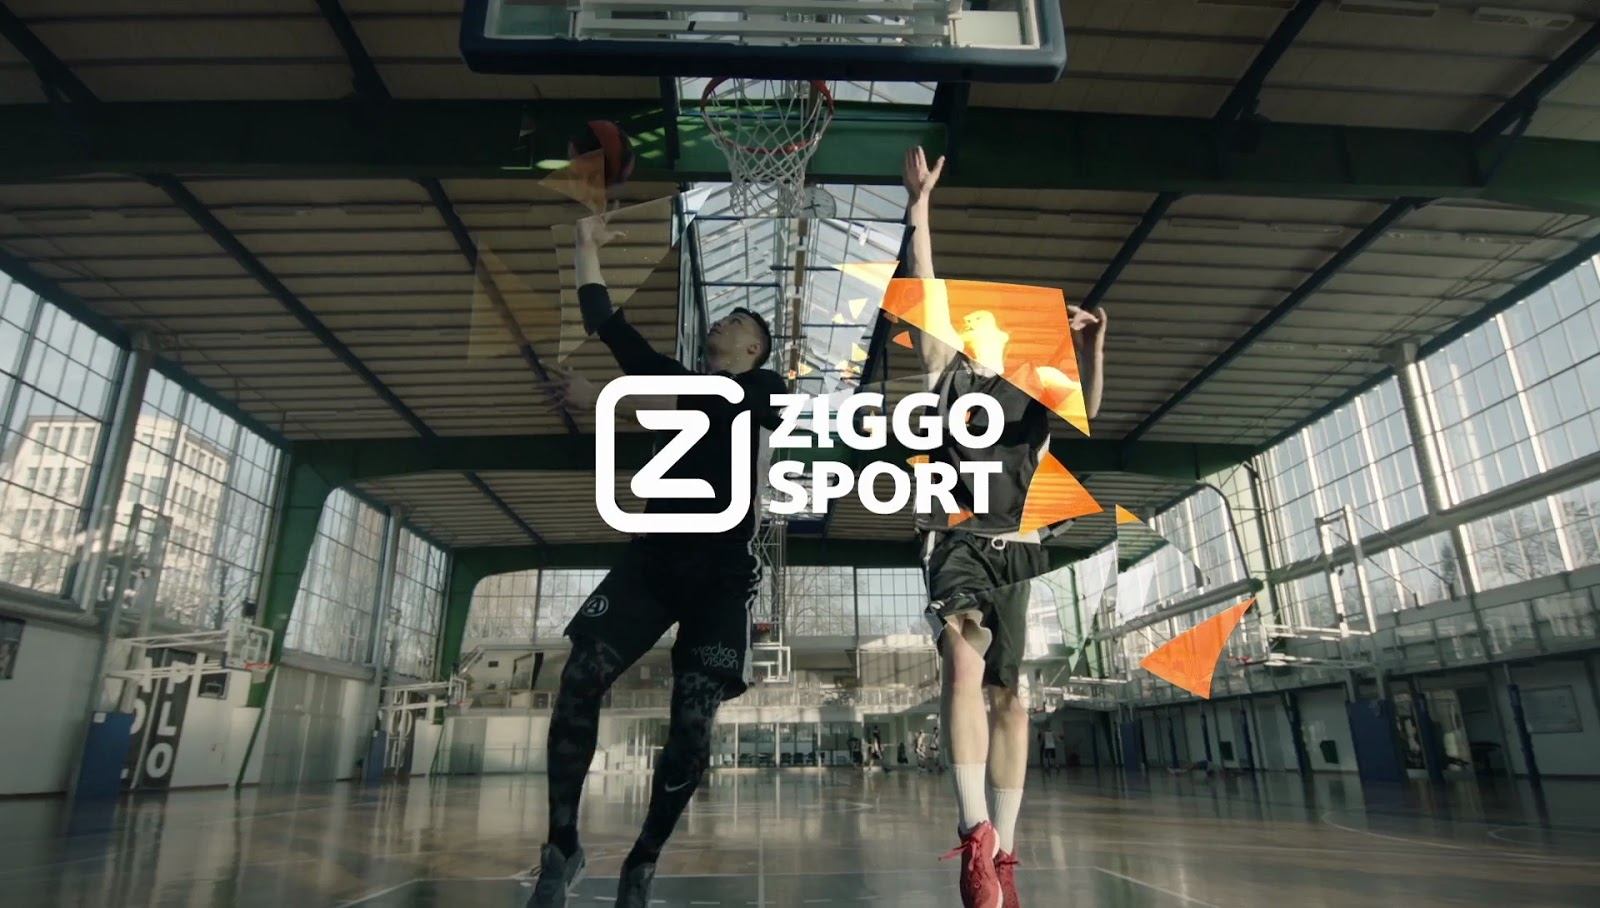 The Branding Source: Cape Rock brings emotion to Ziggo Sport